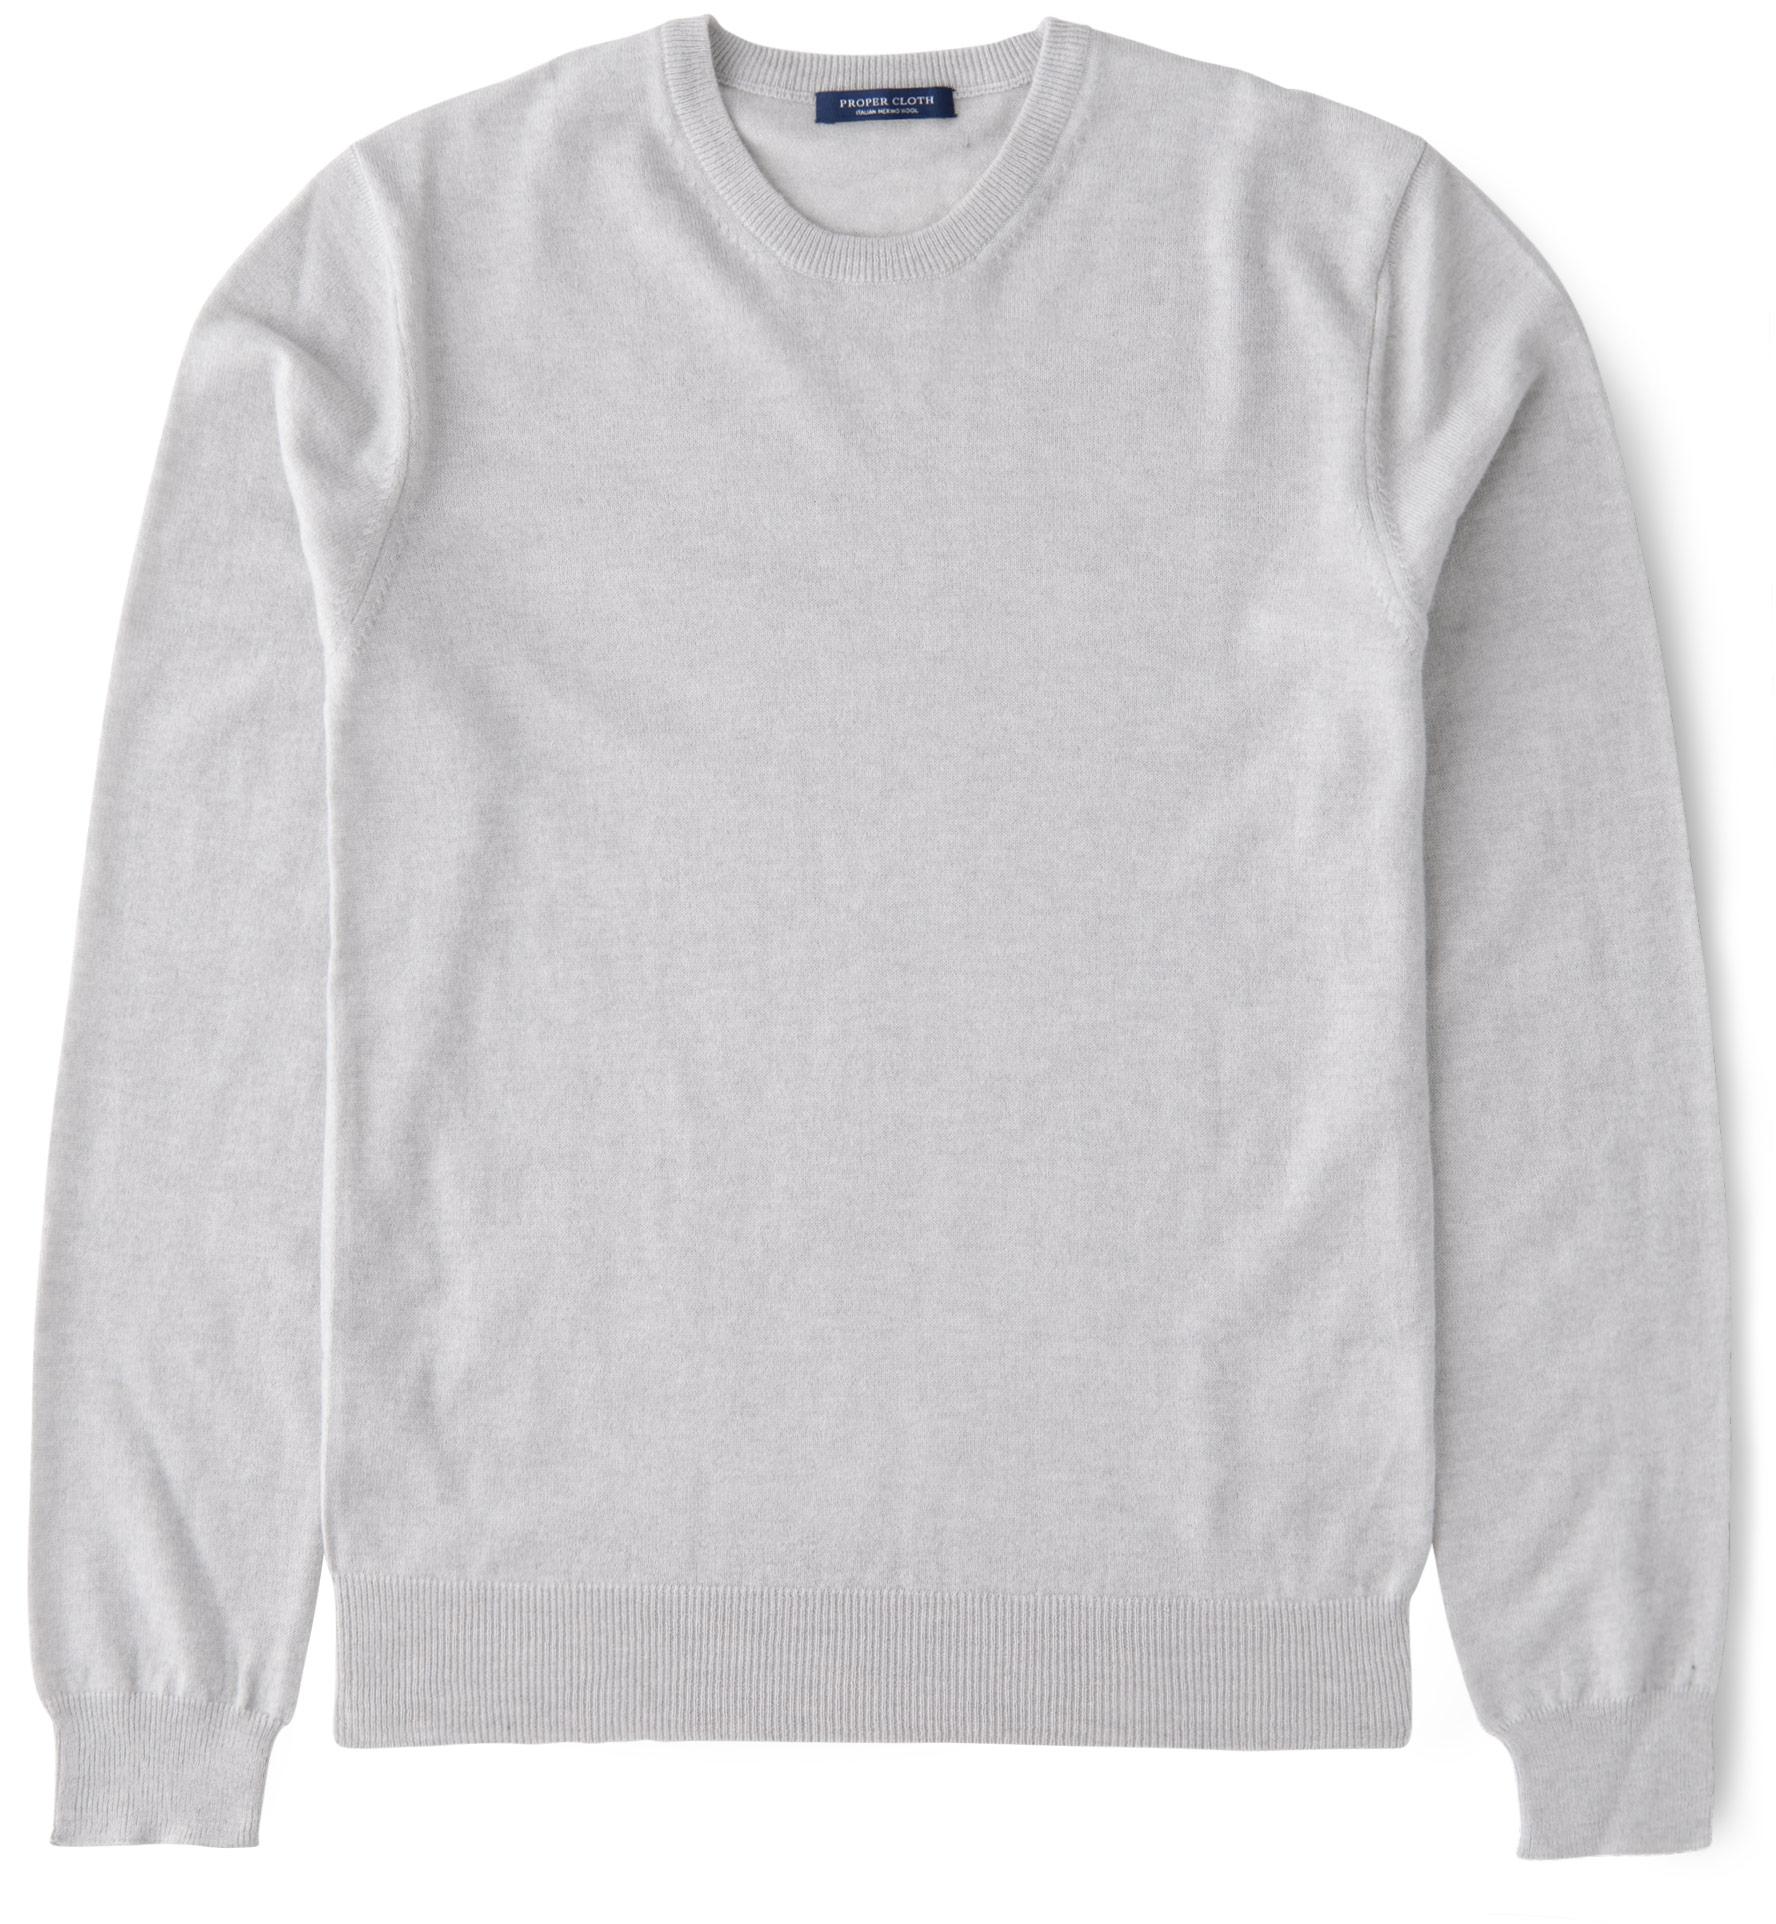 Zoom Image of Natural Melange Merino Crewneck Sweater